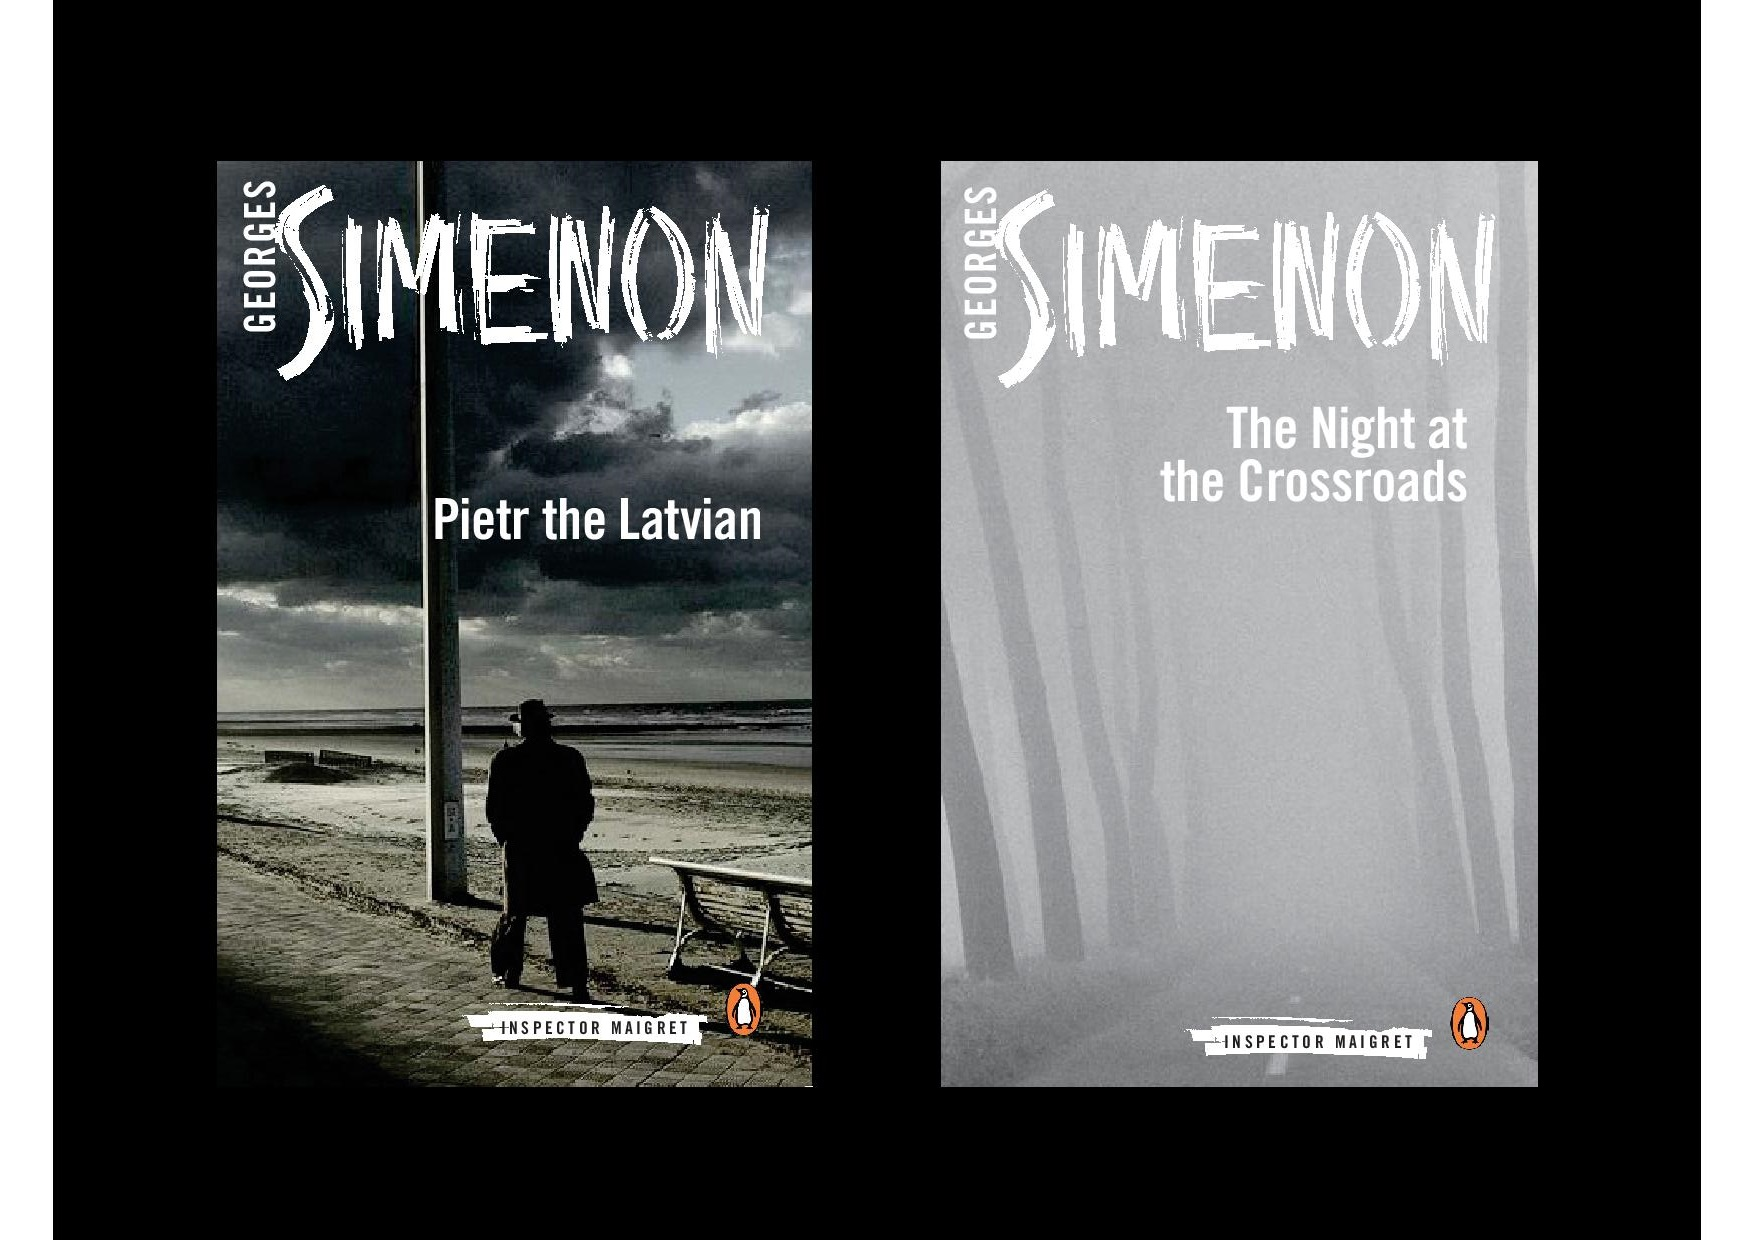 simenon-2-page-001